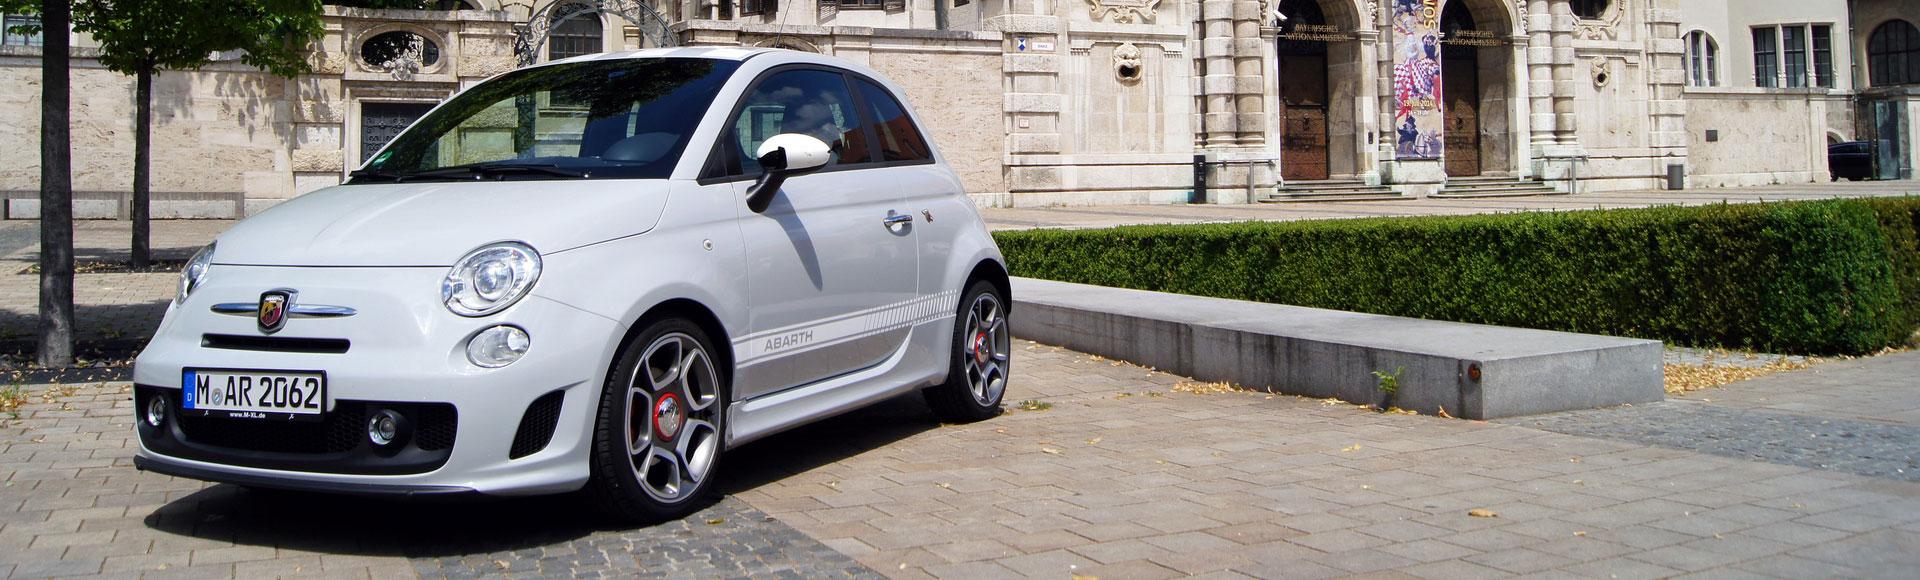 Fiat Abarth 500 2012 Sommer 8070